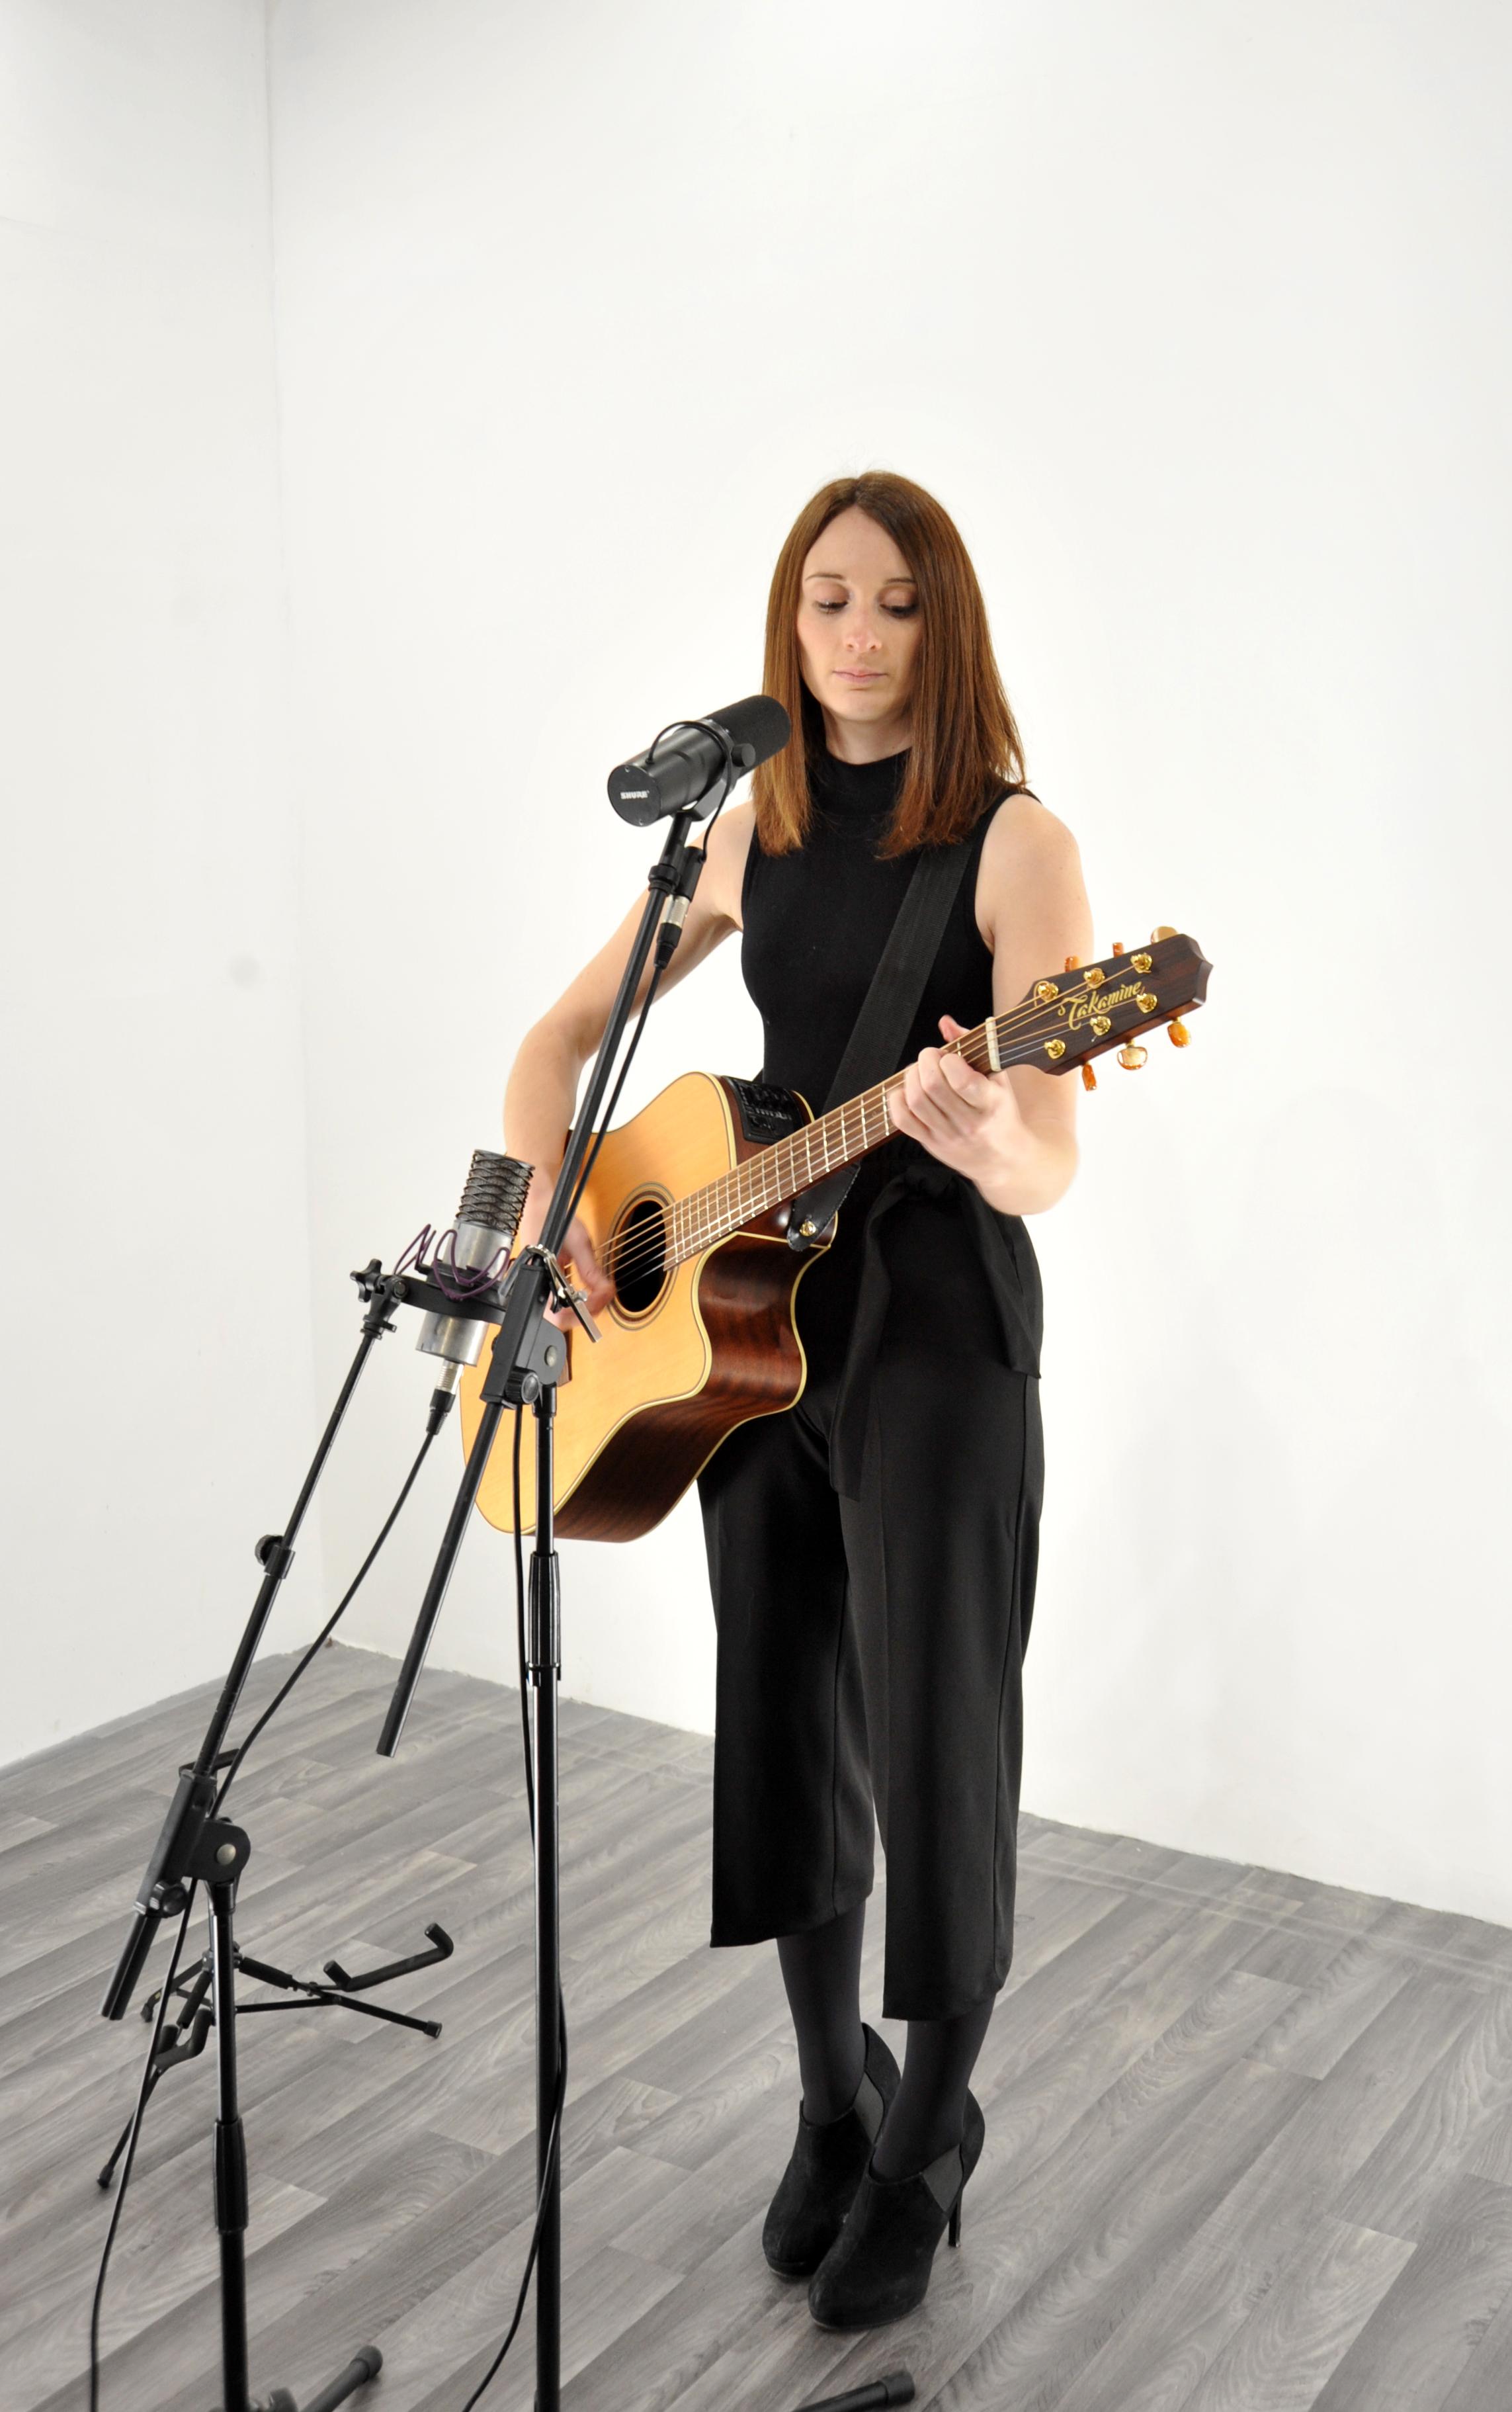 Promo Steph Singer Guitarist West Yorkshire